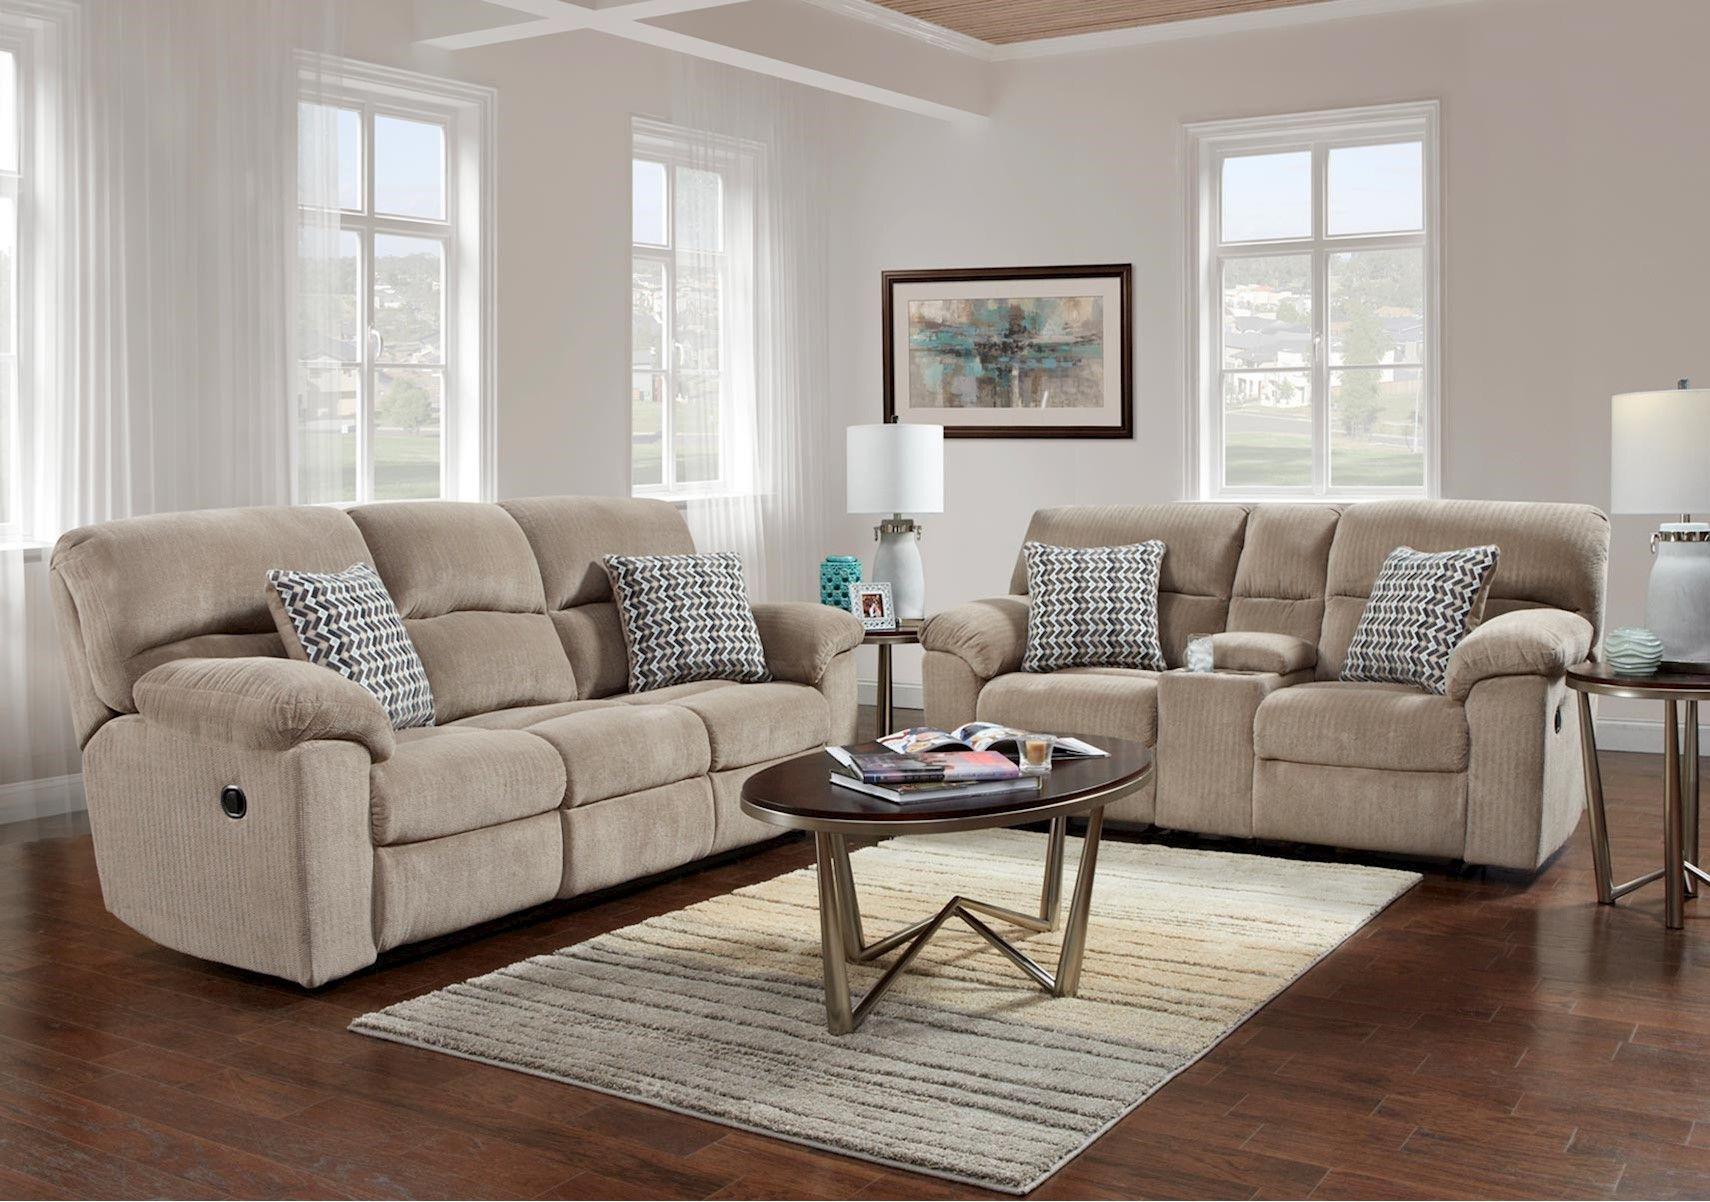 Lacks Chevron Seal 2 Pc Reclining Living Room Set Reclining